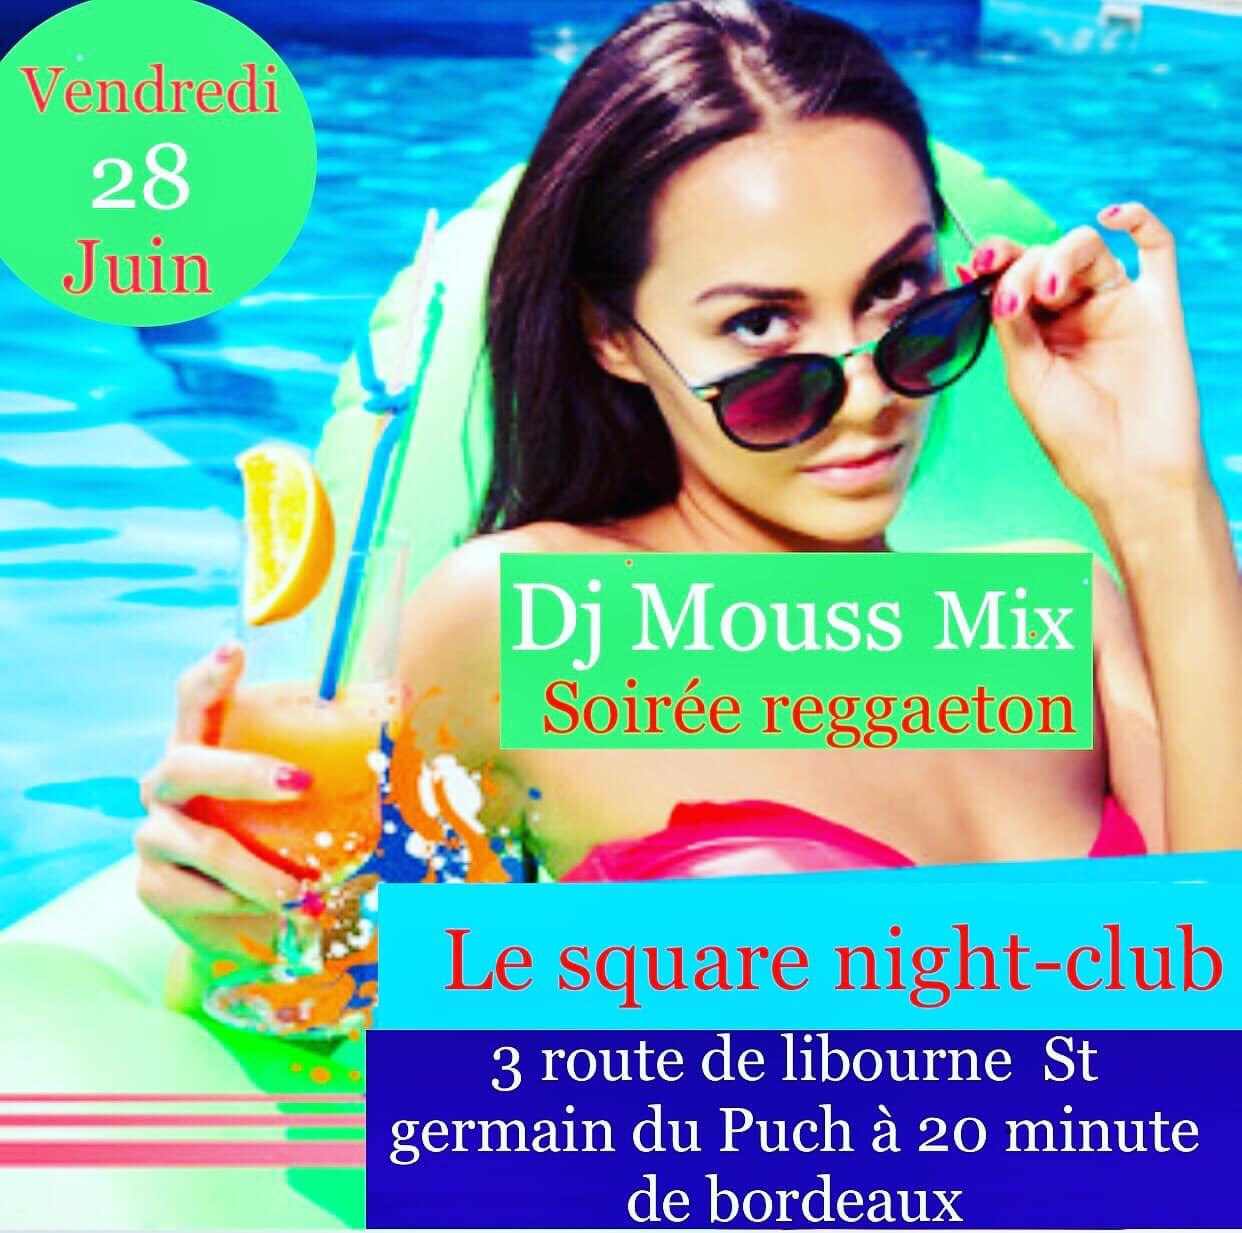 soiree reggateon 28 juin 2019 le square